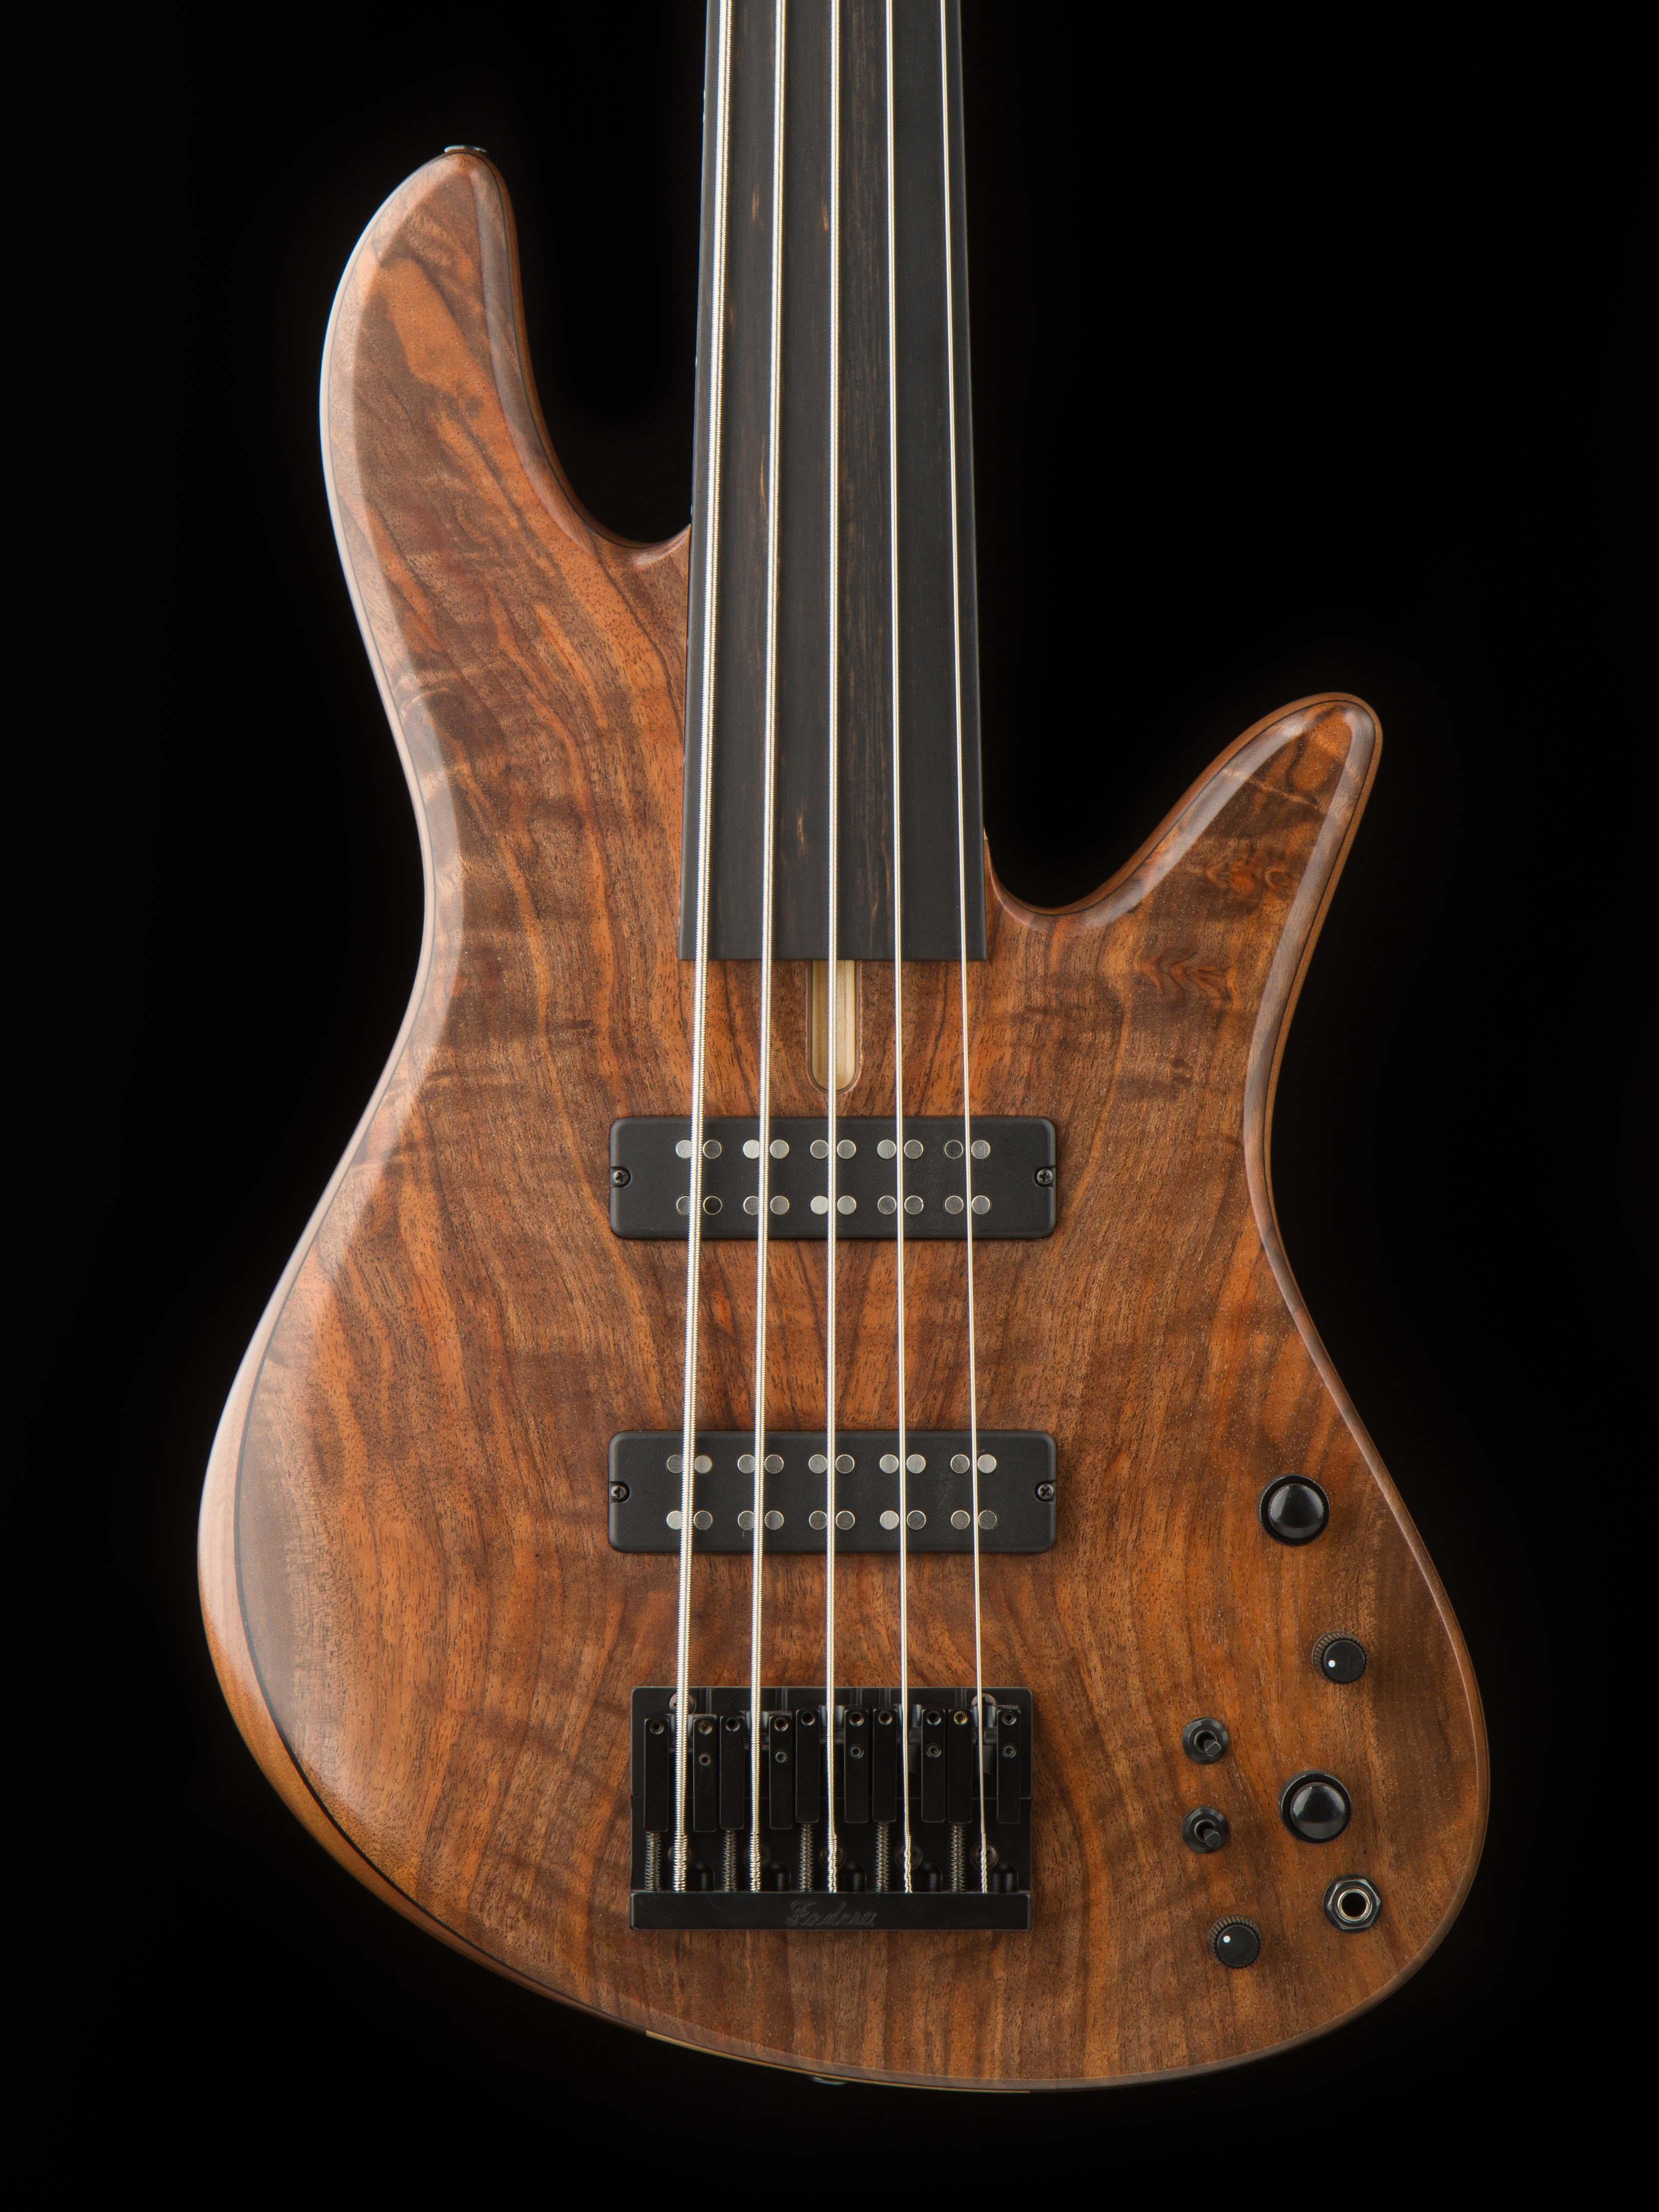 emperor 5 standard fretless bass guitars emperor bass guitars fodera guitars. Black Bedroom Furniture Sets. Home Design Ideas